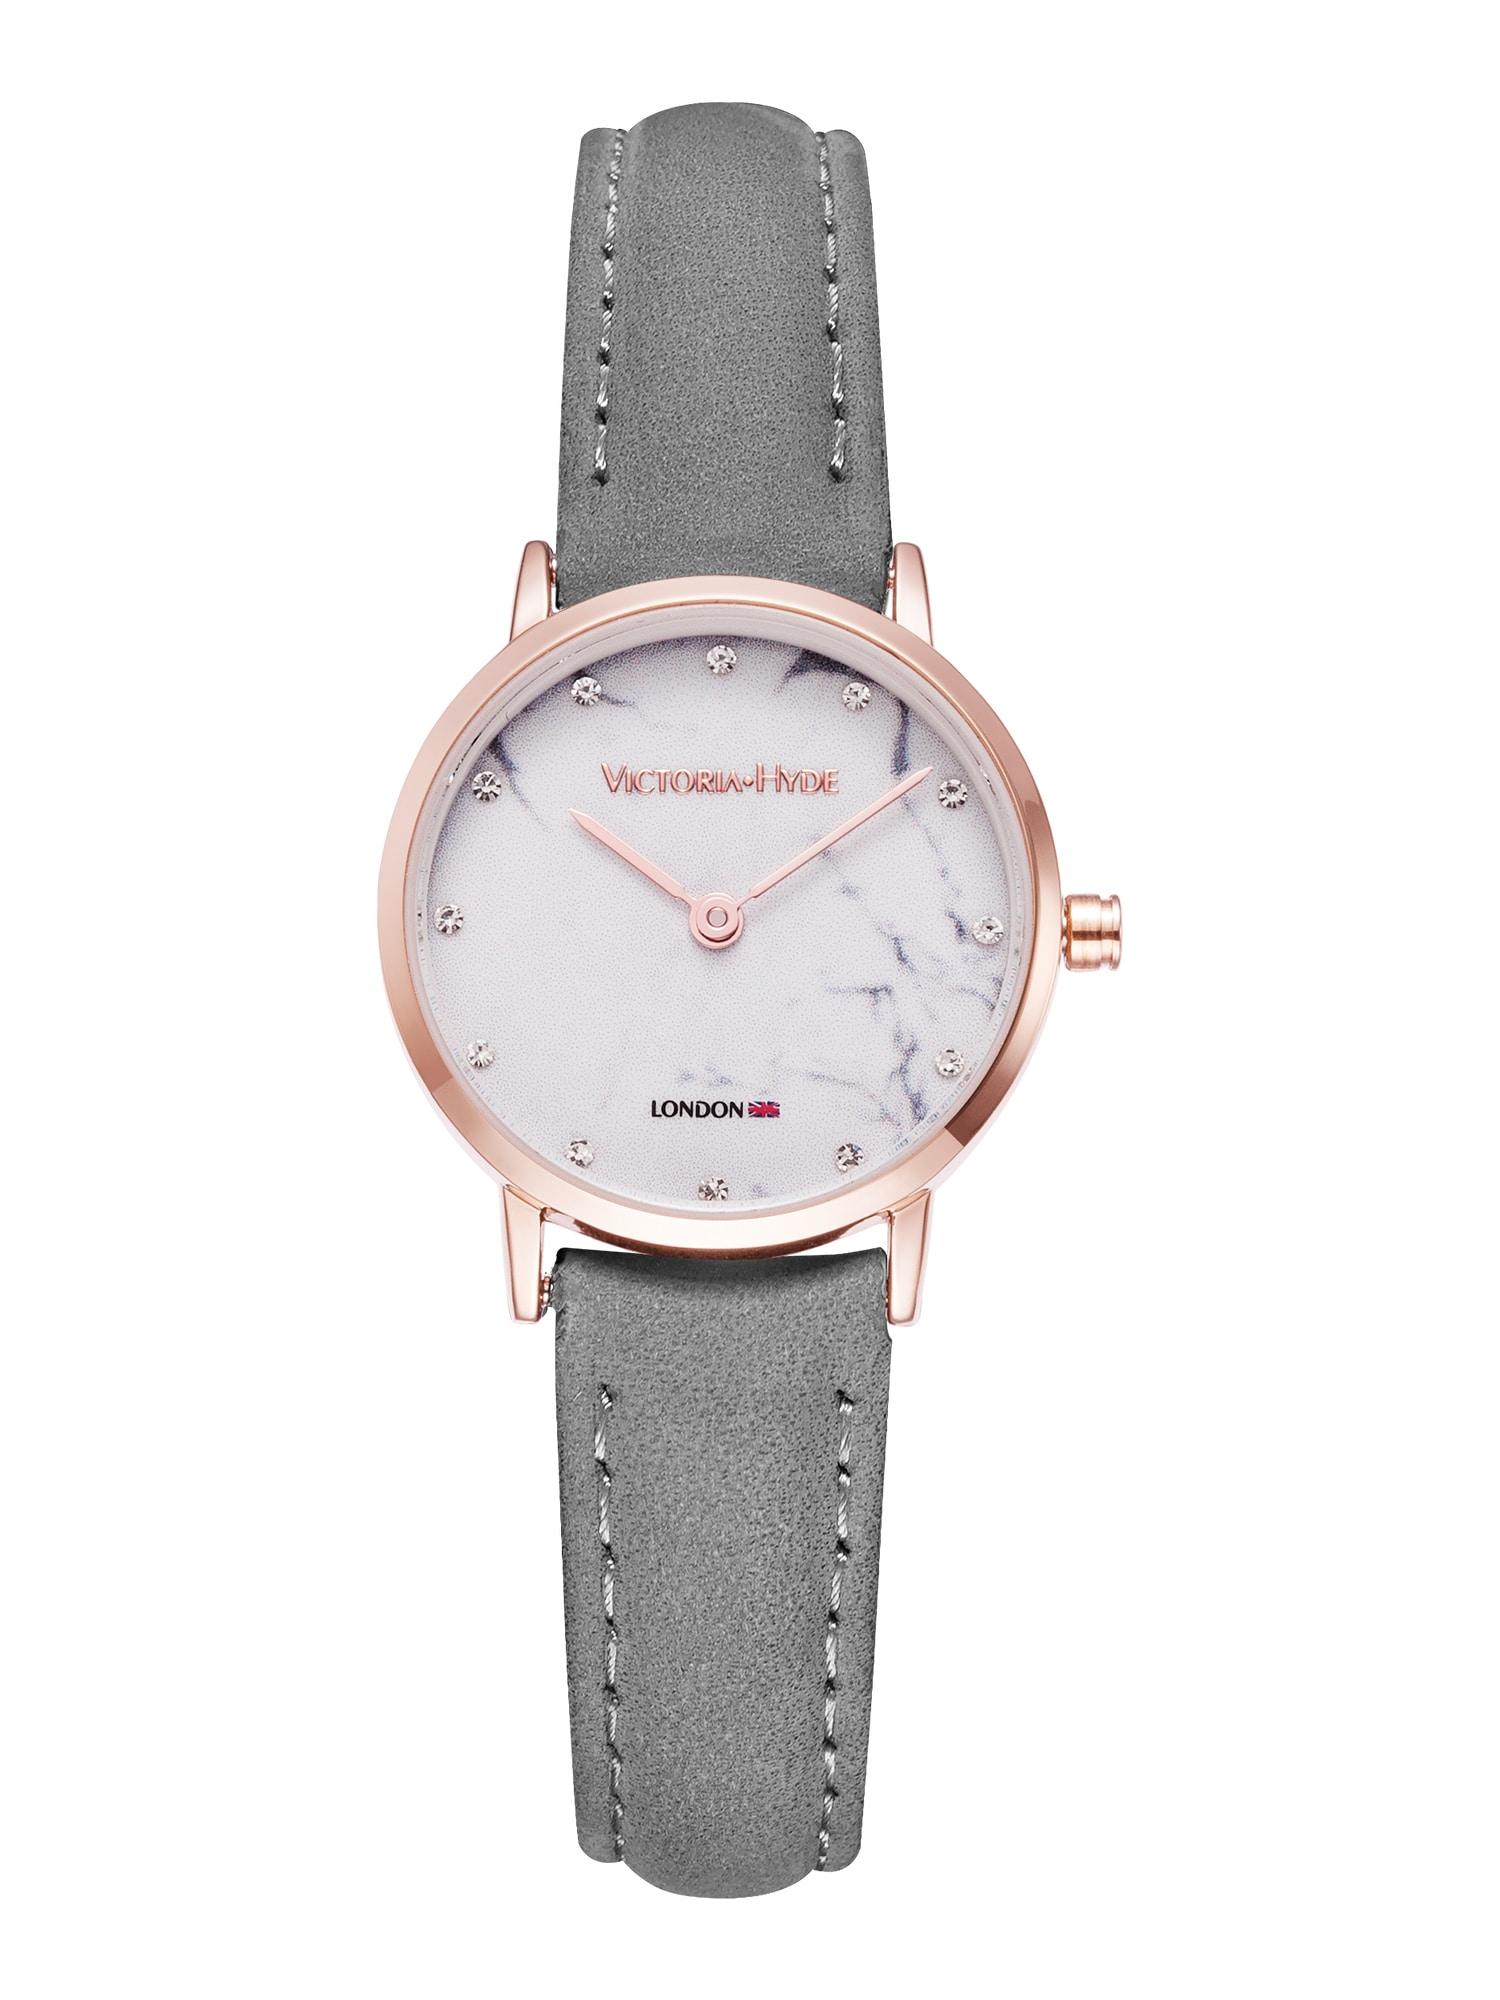 Armbanduhr | Uhren | Silbergrau | Victoria Hyde